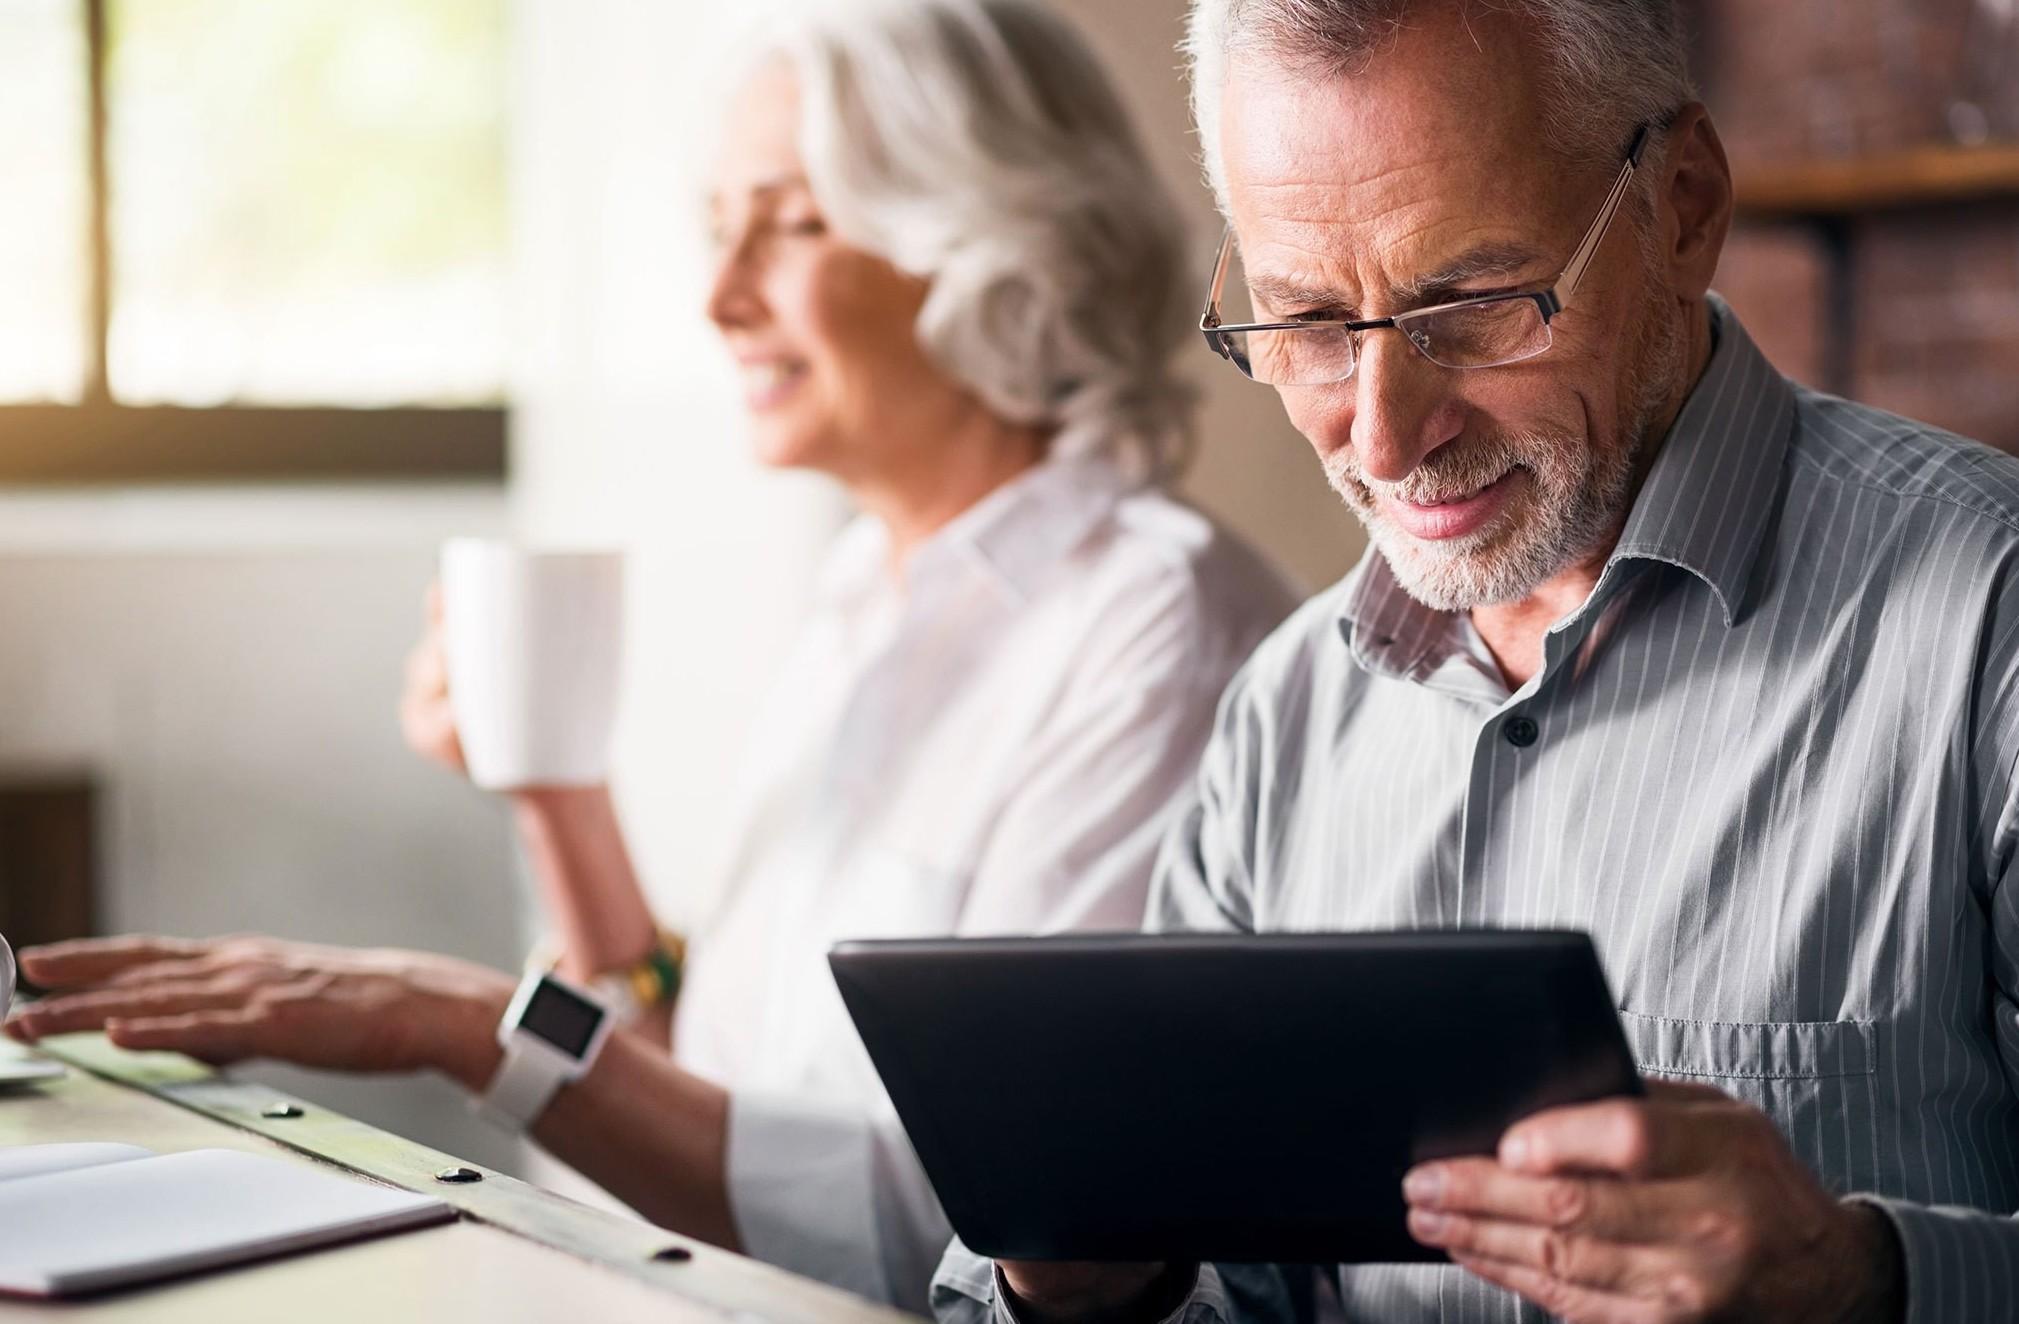 Pensione anticipata requisiti, contribut